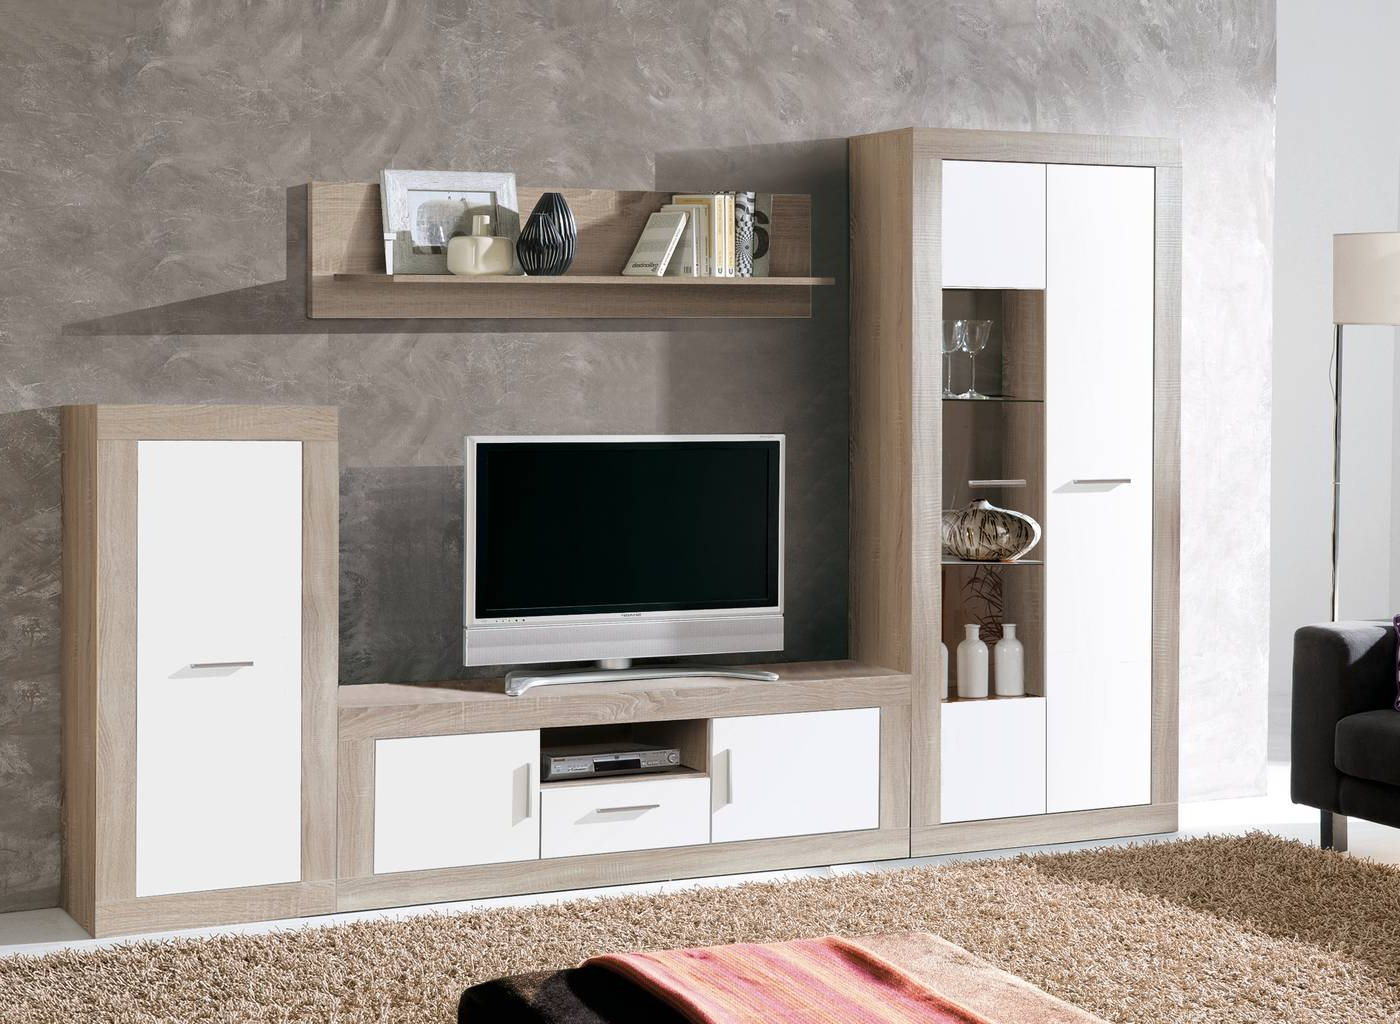 Muebles Salon Blanco Y Madera 4pde Oferta De Mueble Online Salà N Edor Moderno Online Modular